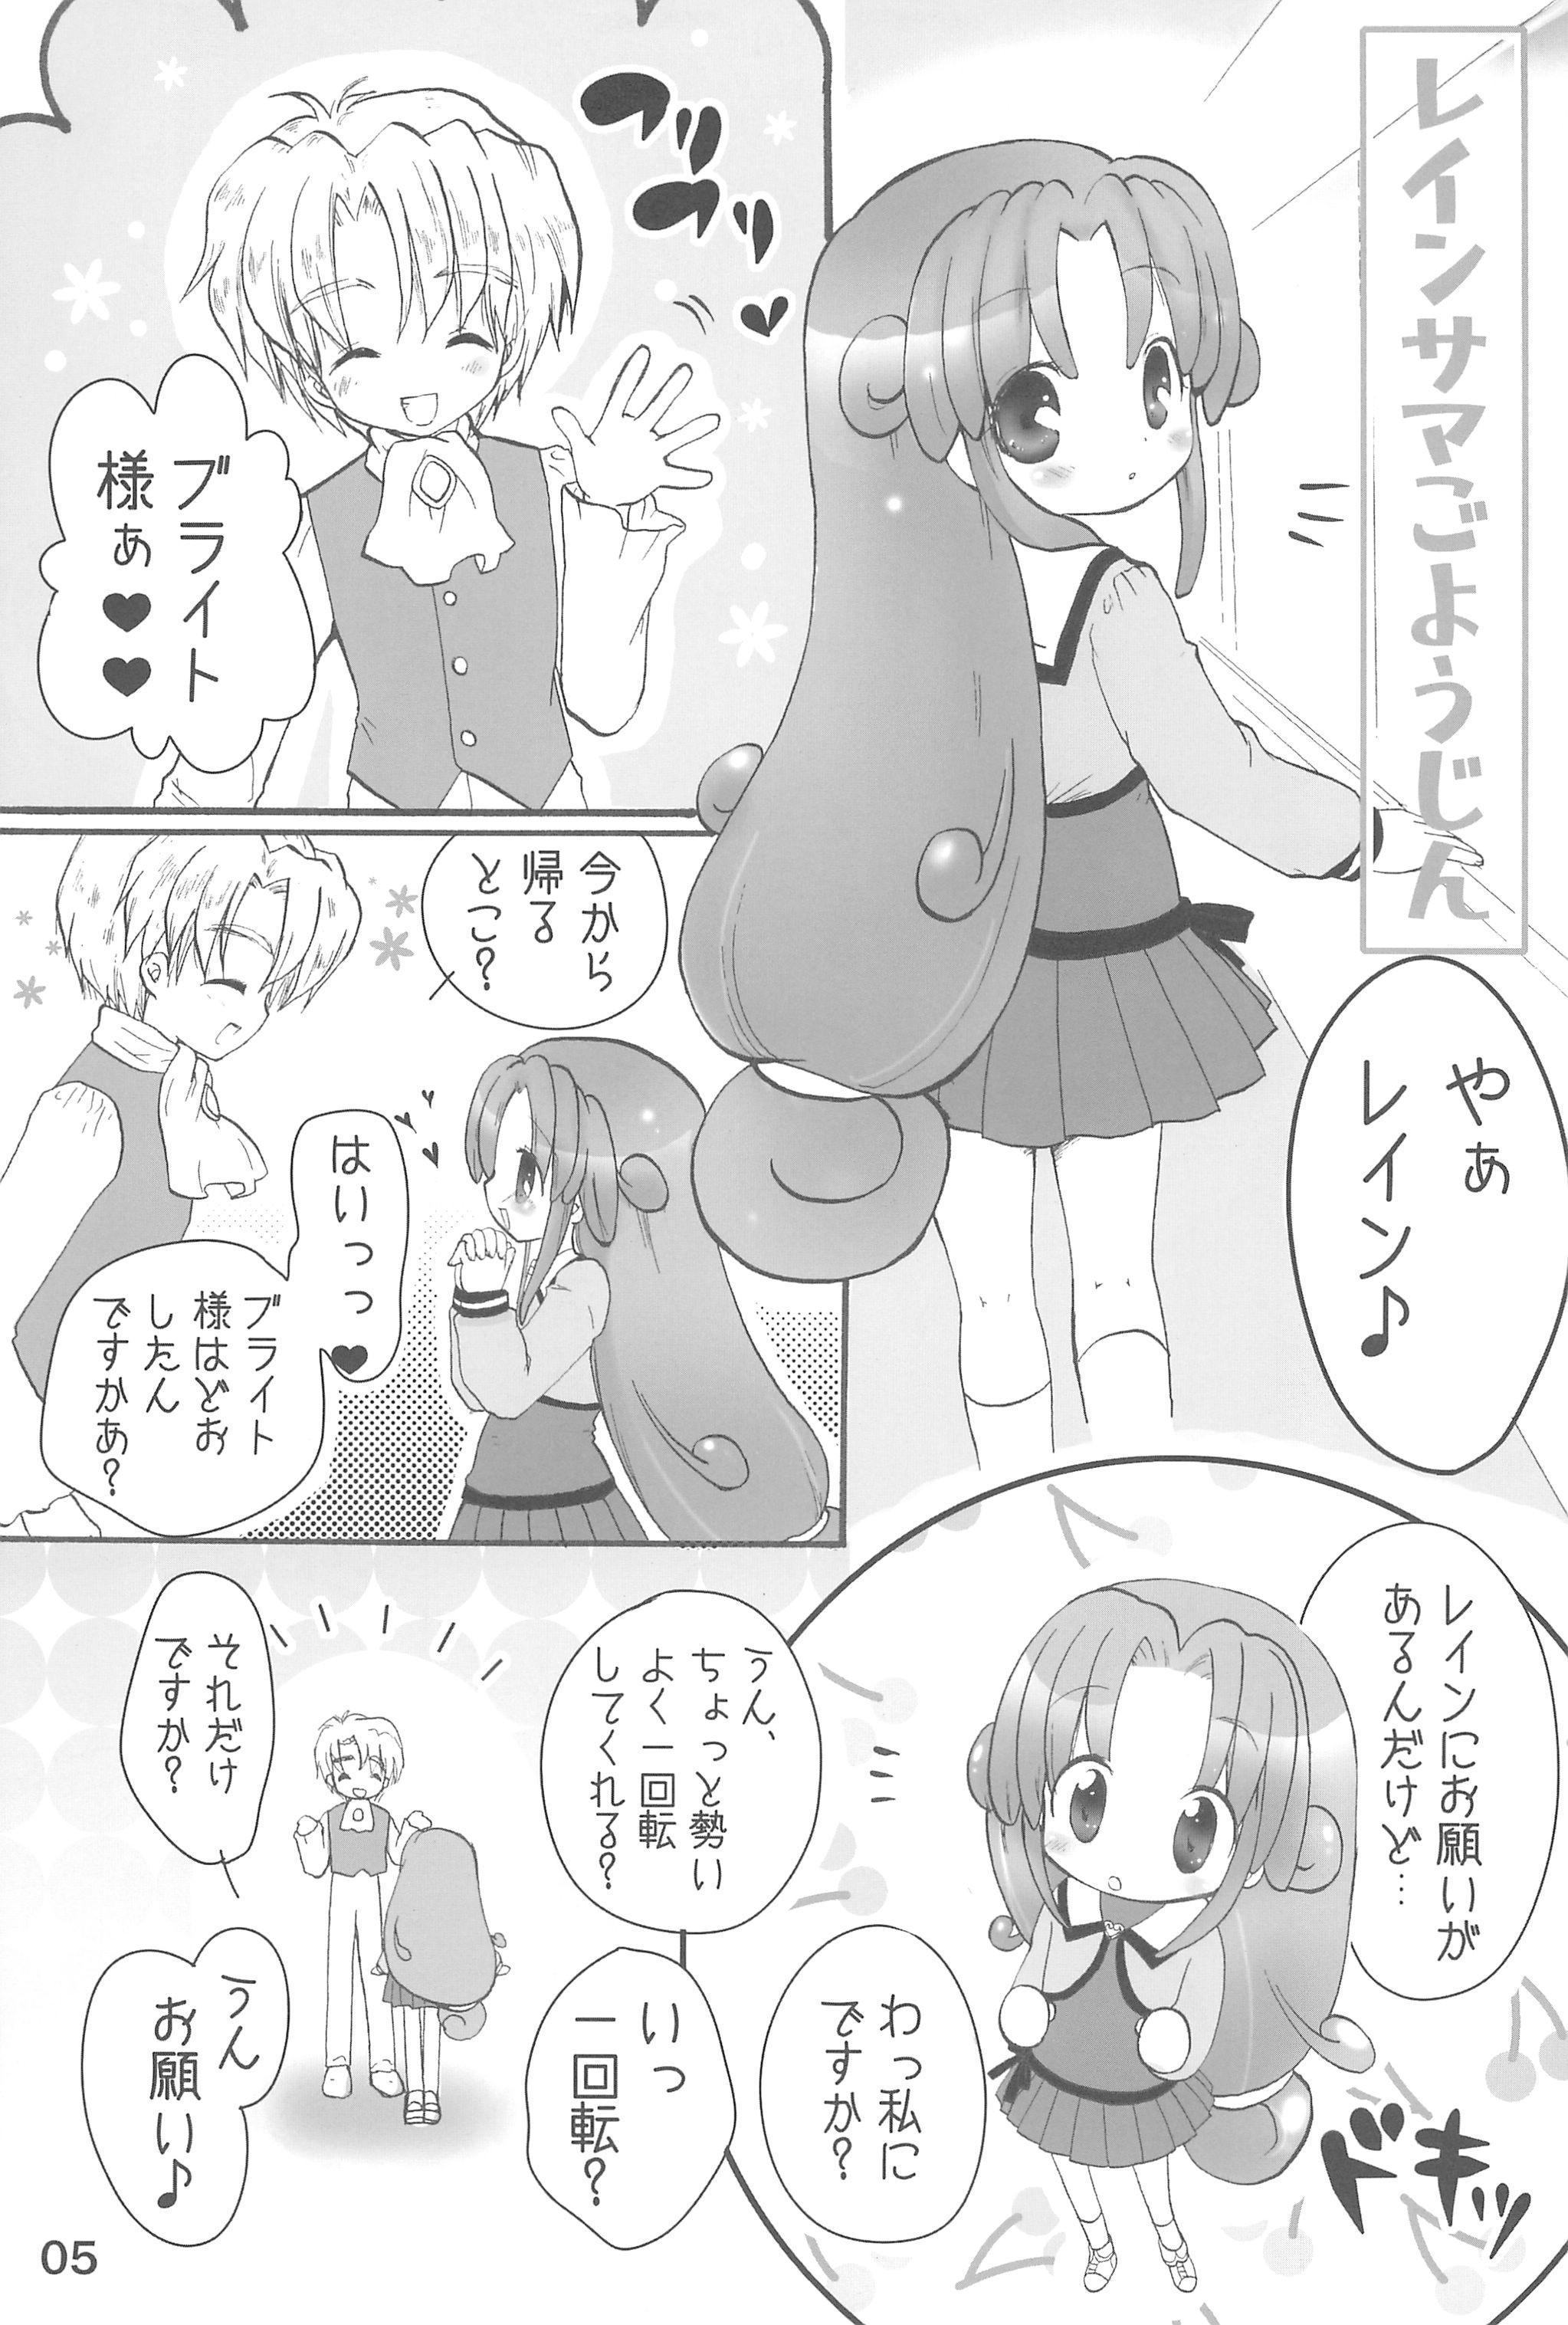 Rein-sama, Goyoujin! 4